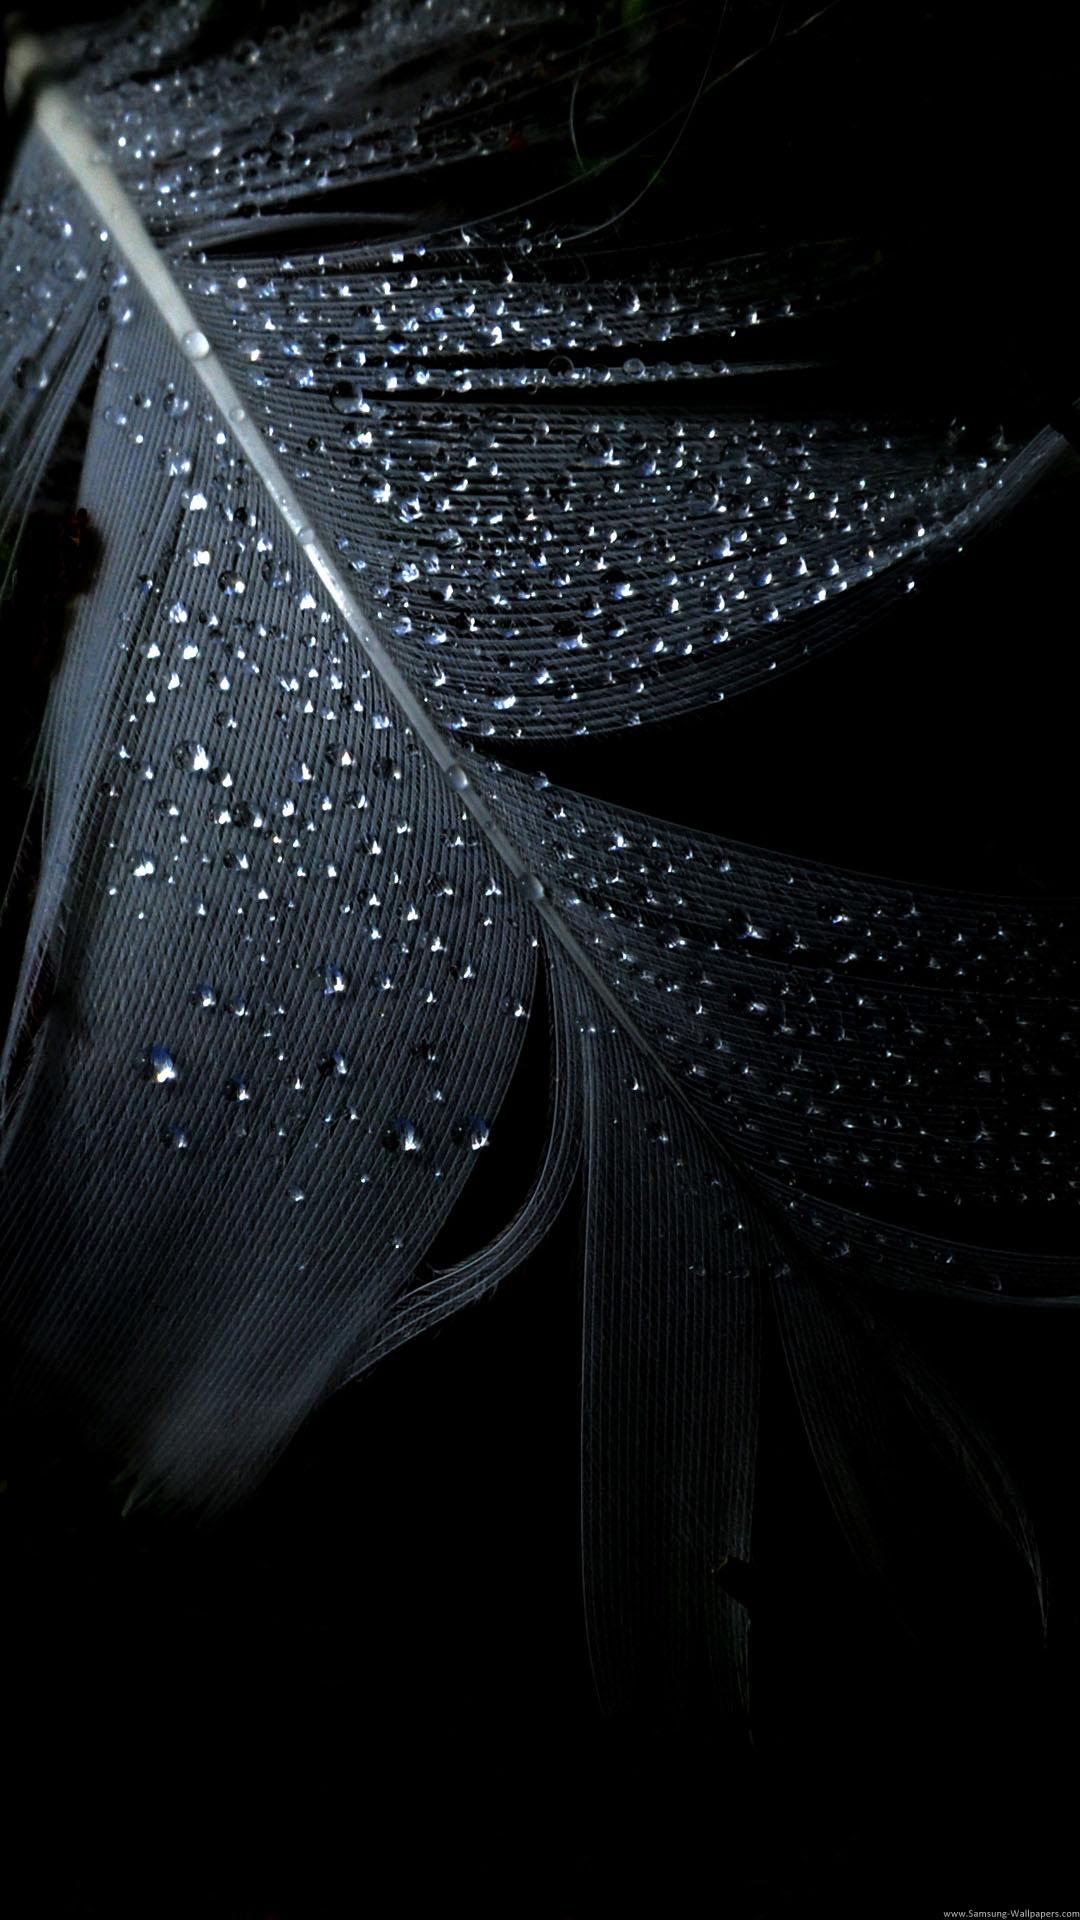 Black Feather Rain Drops iPhone 6 Plus HD Wallpaper iPod Wallpaper 1080x1920